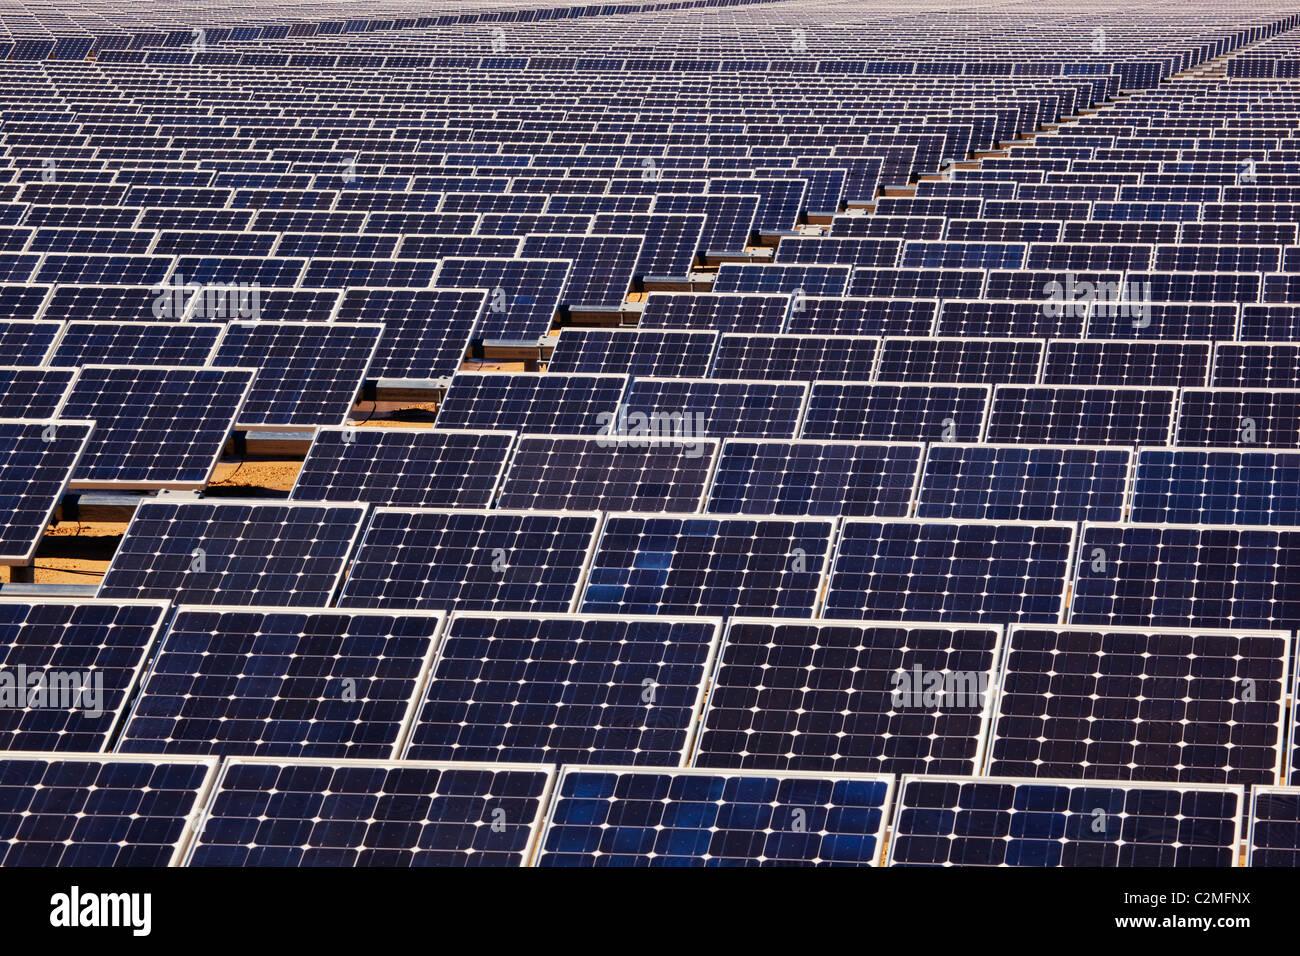 Solar Energy Panels, San Roque, Cadiz, Spain - Stock Image